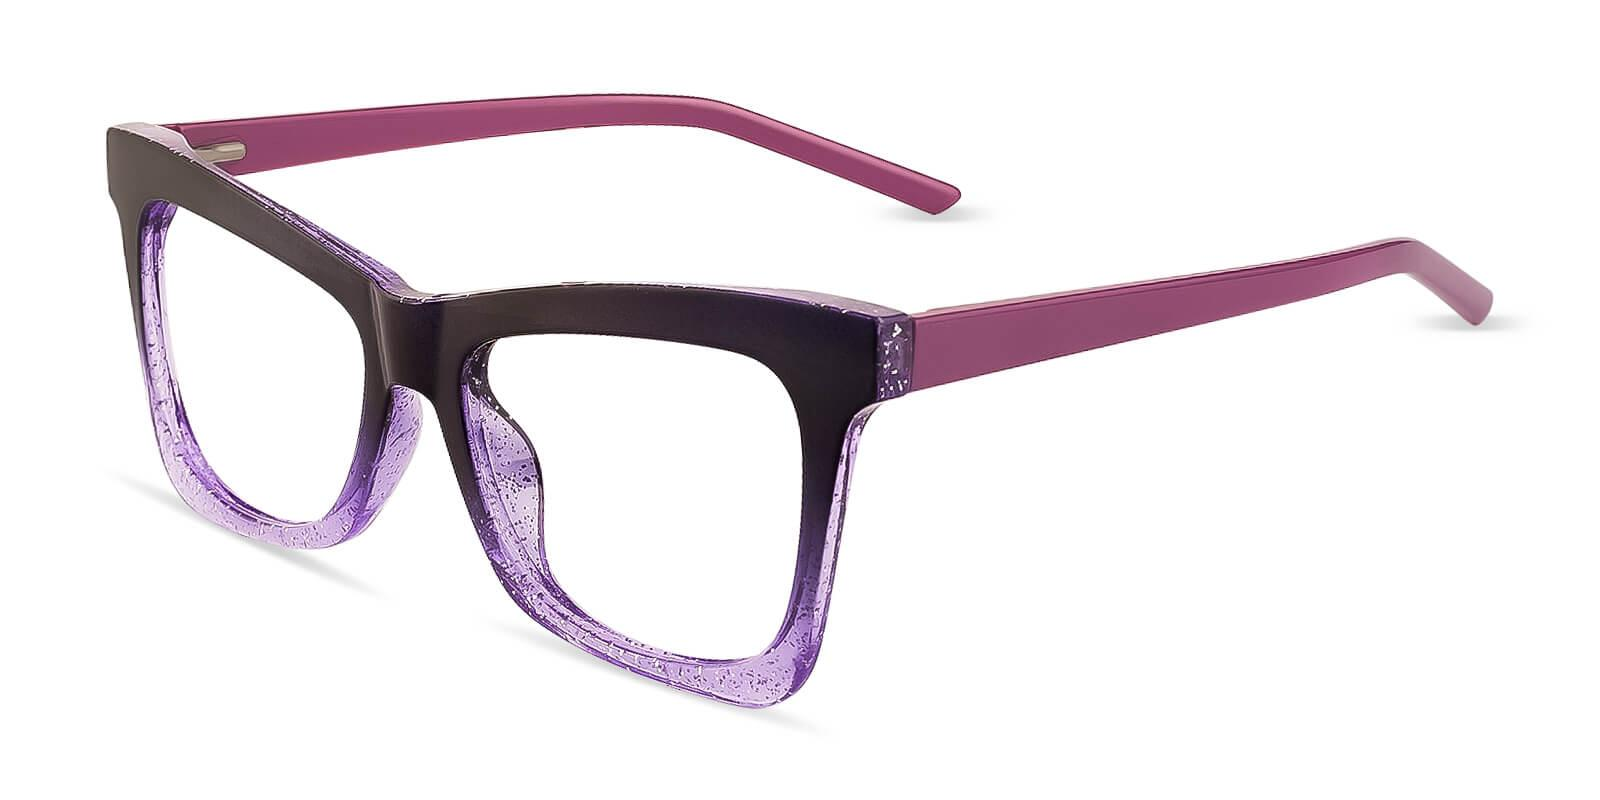 Focal Purple TR Eyeglasses , Fashion , UniversalBridgeFit Frames from ABBE Glasses